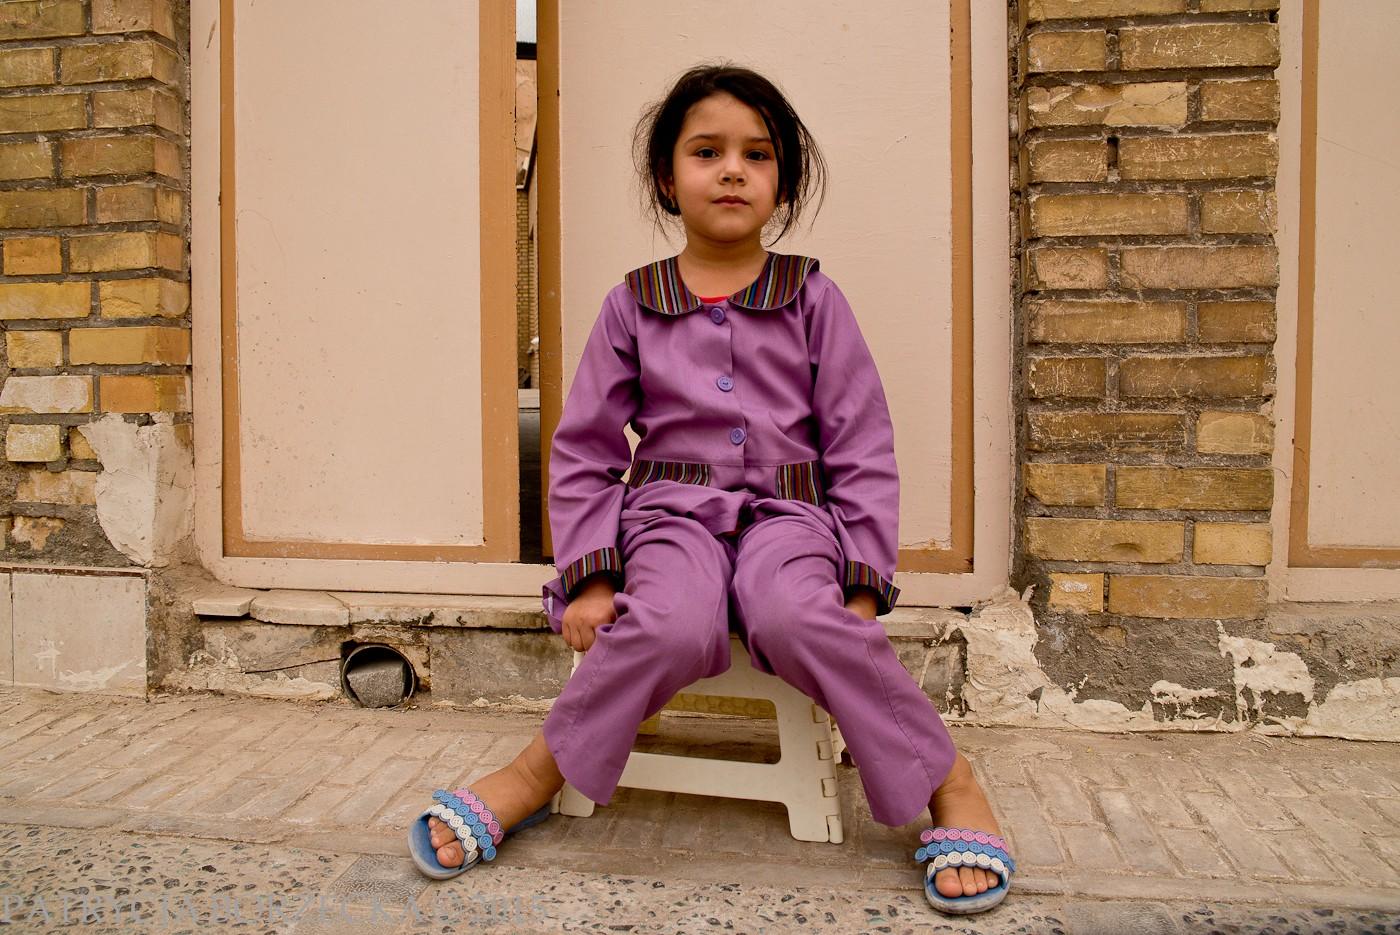 PatrycjaBorzecka-photography-Iran-people07